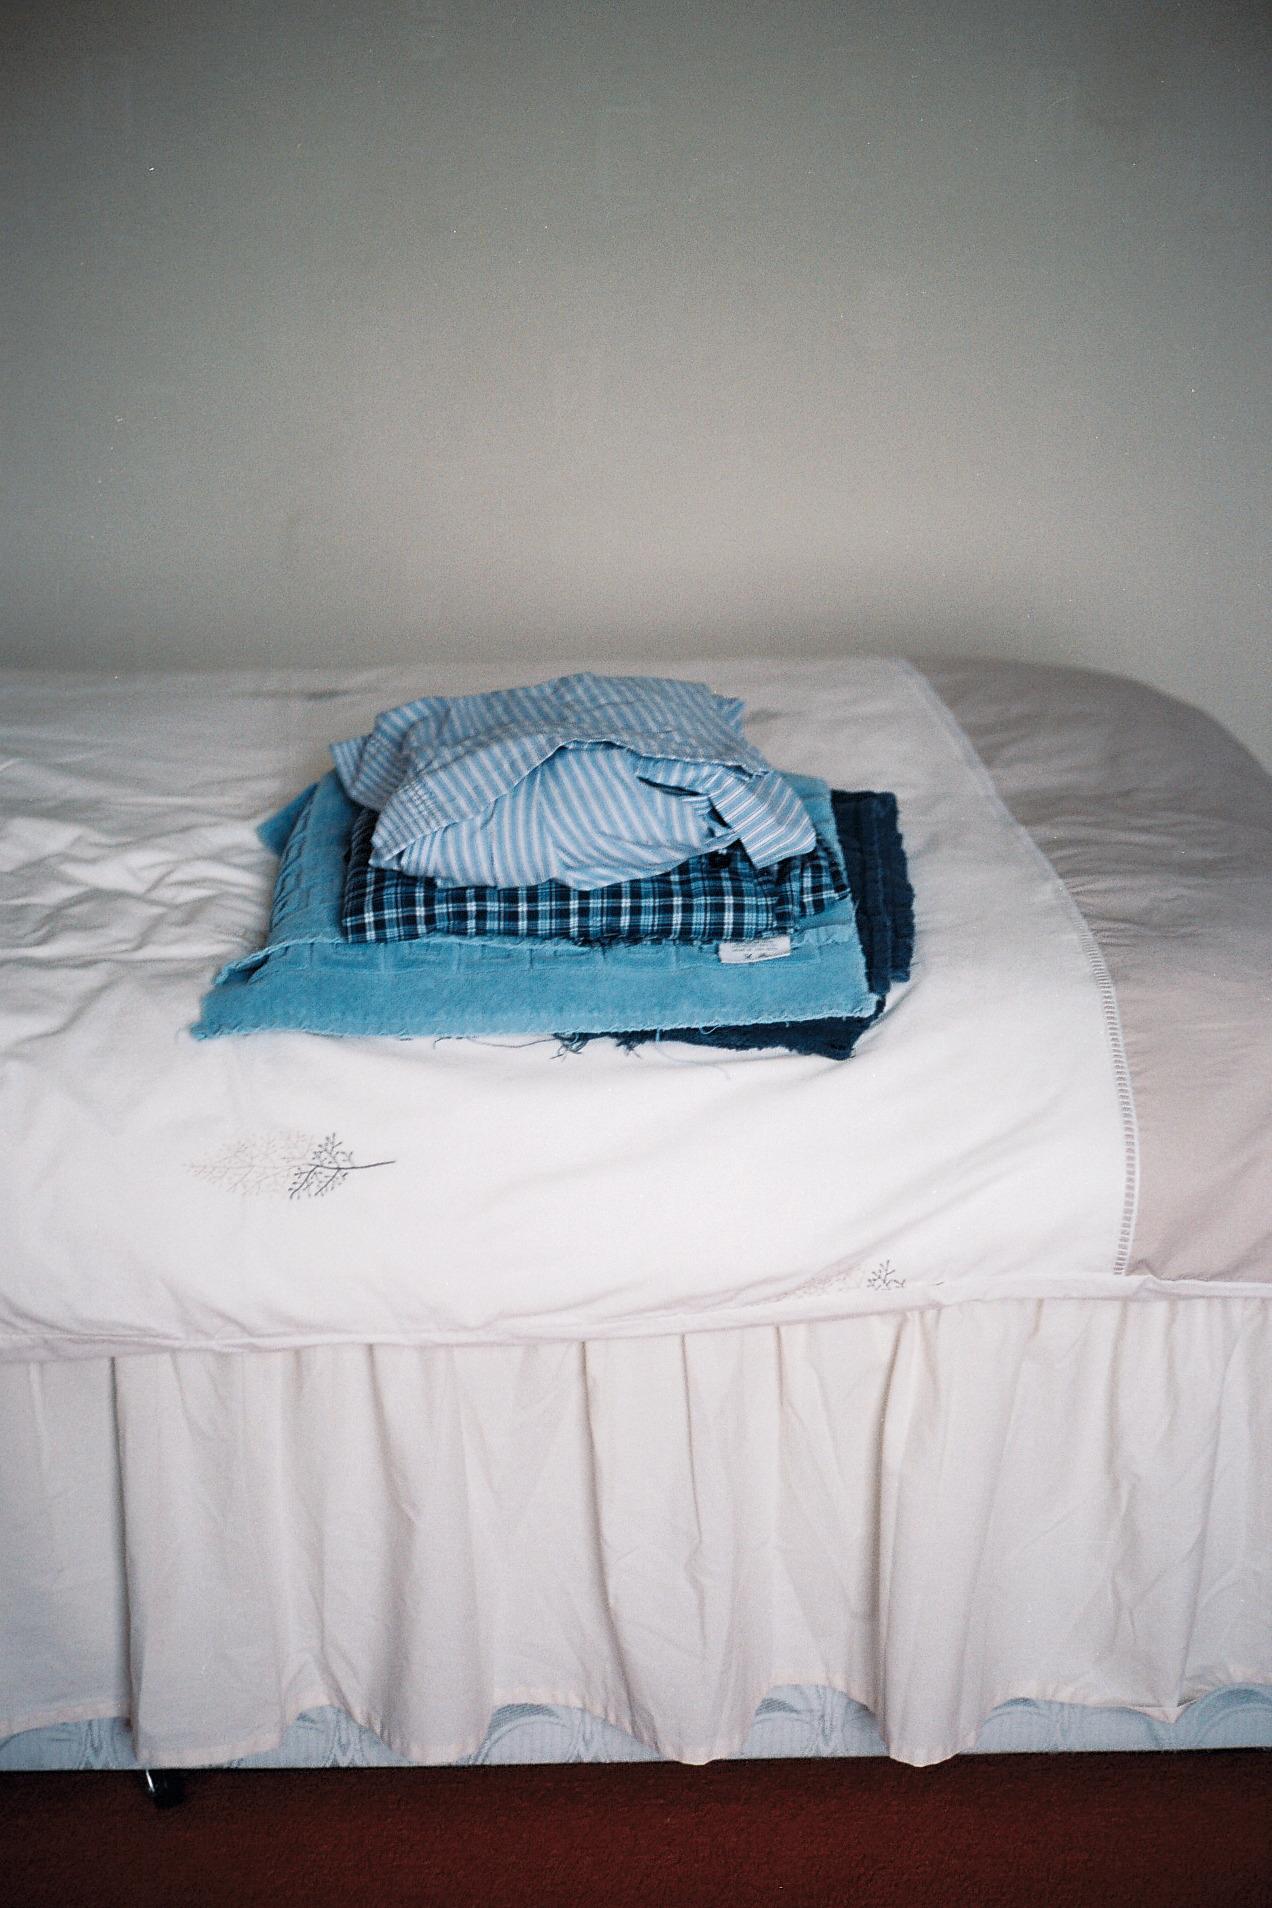 Alex_folded clothes.jpg